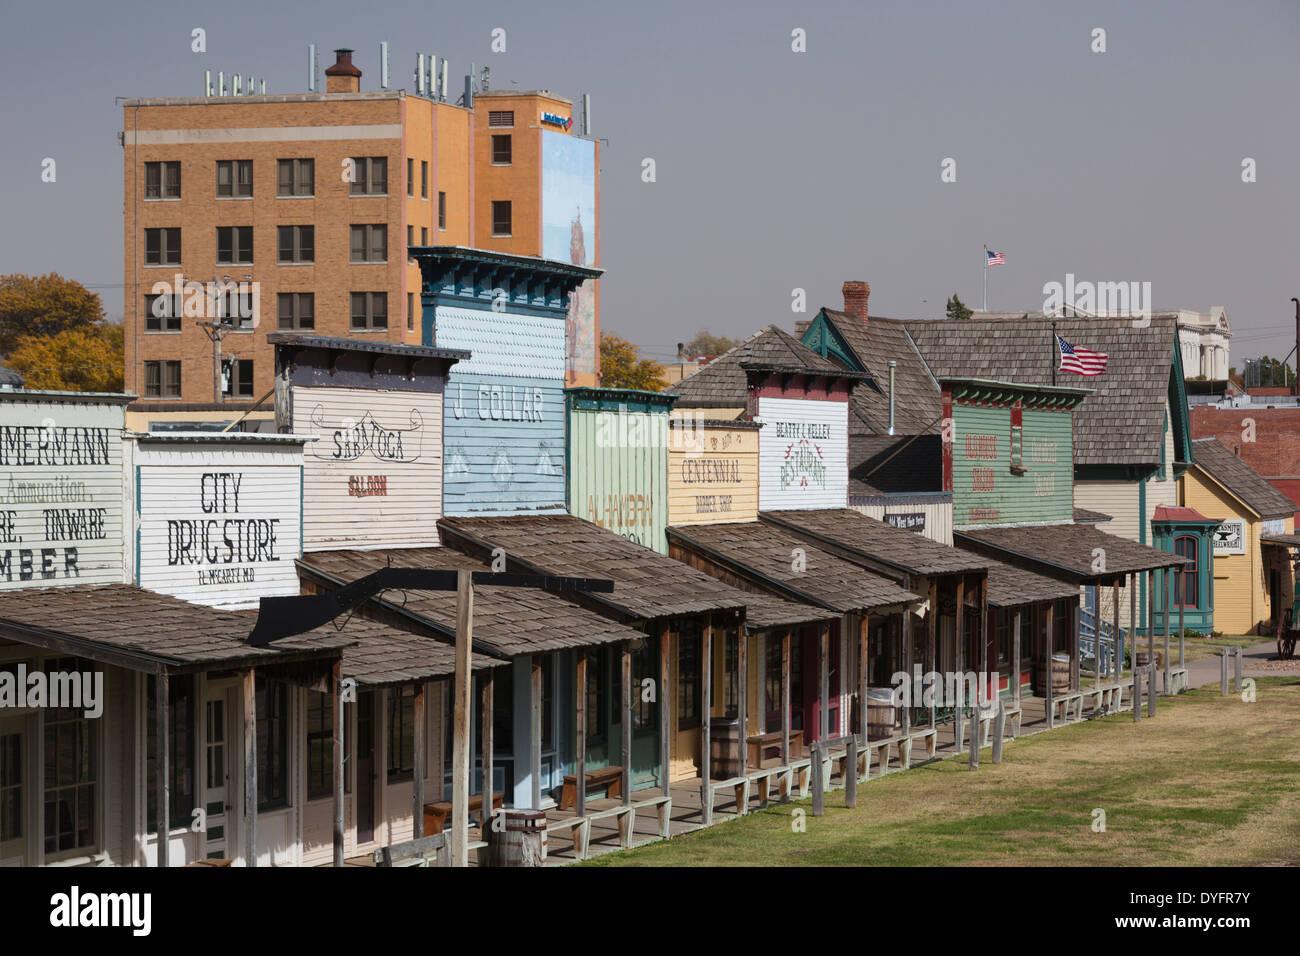 Usa kansas dodge city boot hill museum exterior stock photo royalty free image 68574351 alamy for American exteriors kc